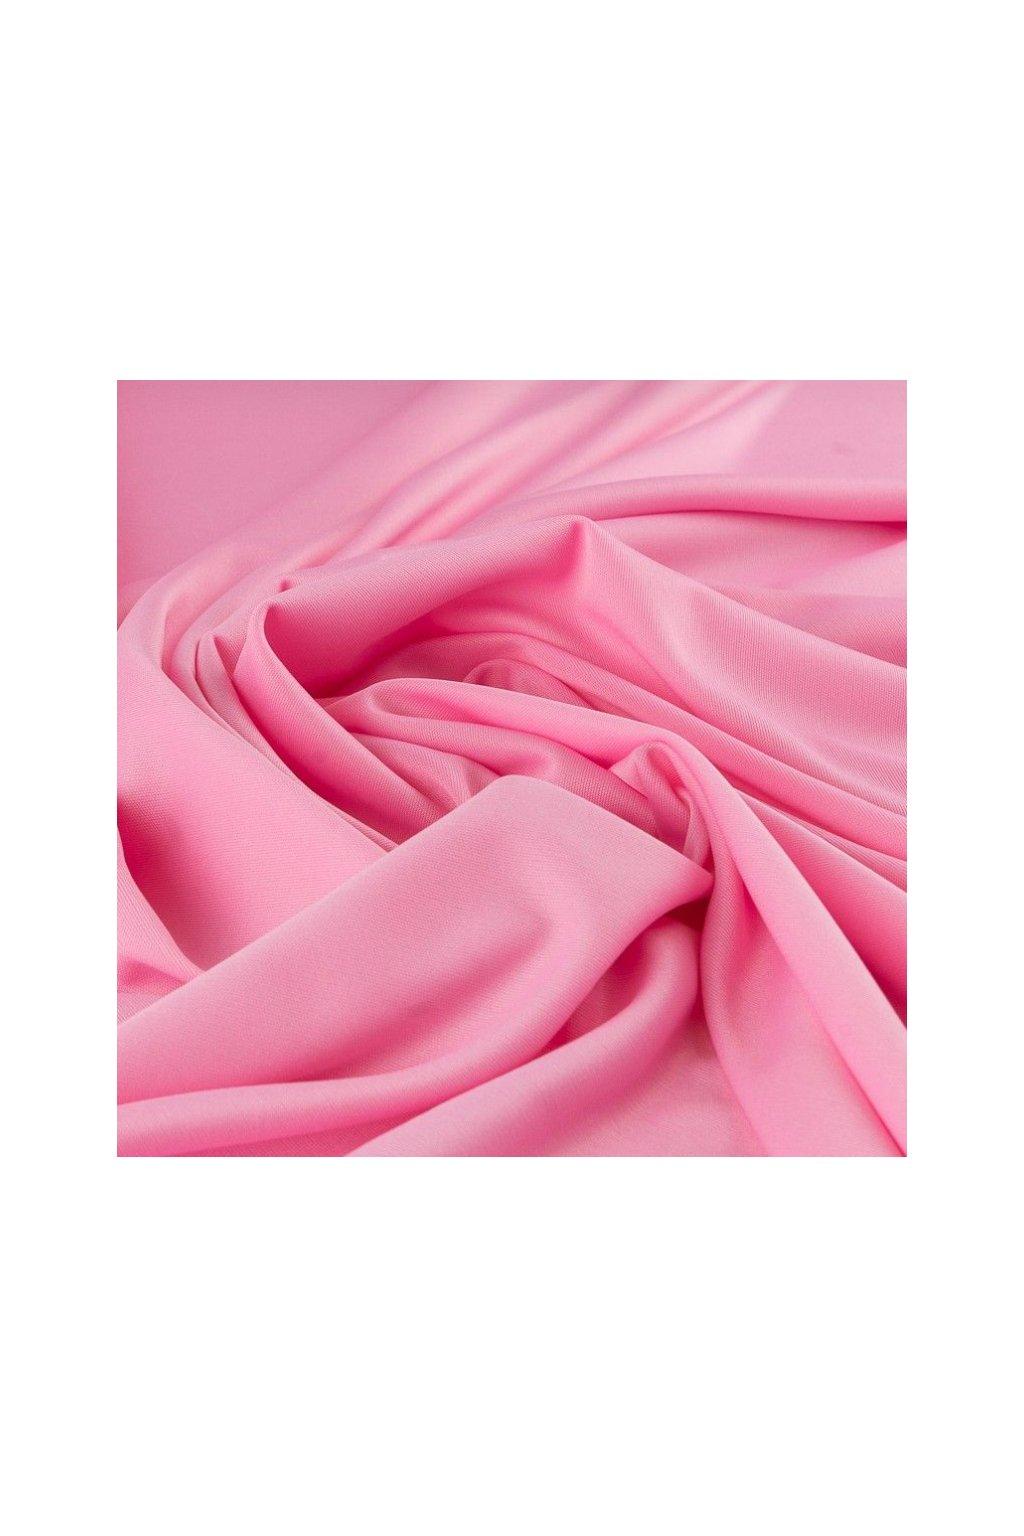 Rose silk1